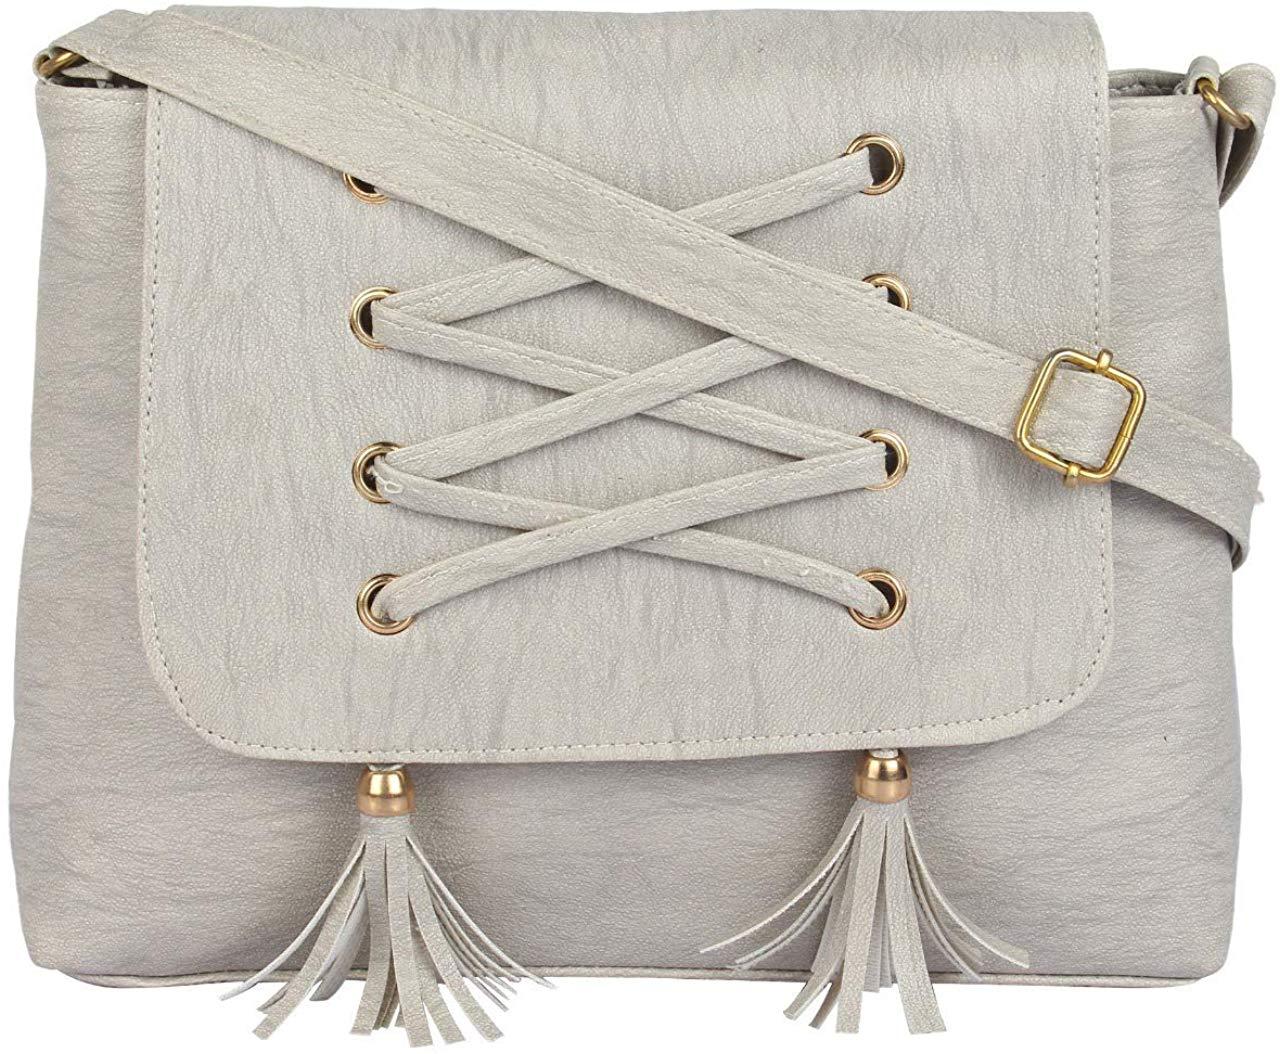 RITUPAL COLLECTION Sling Handbag for Women